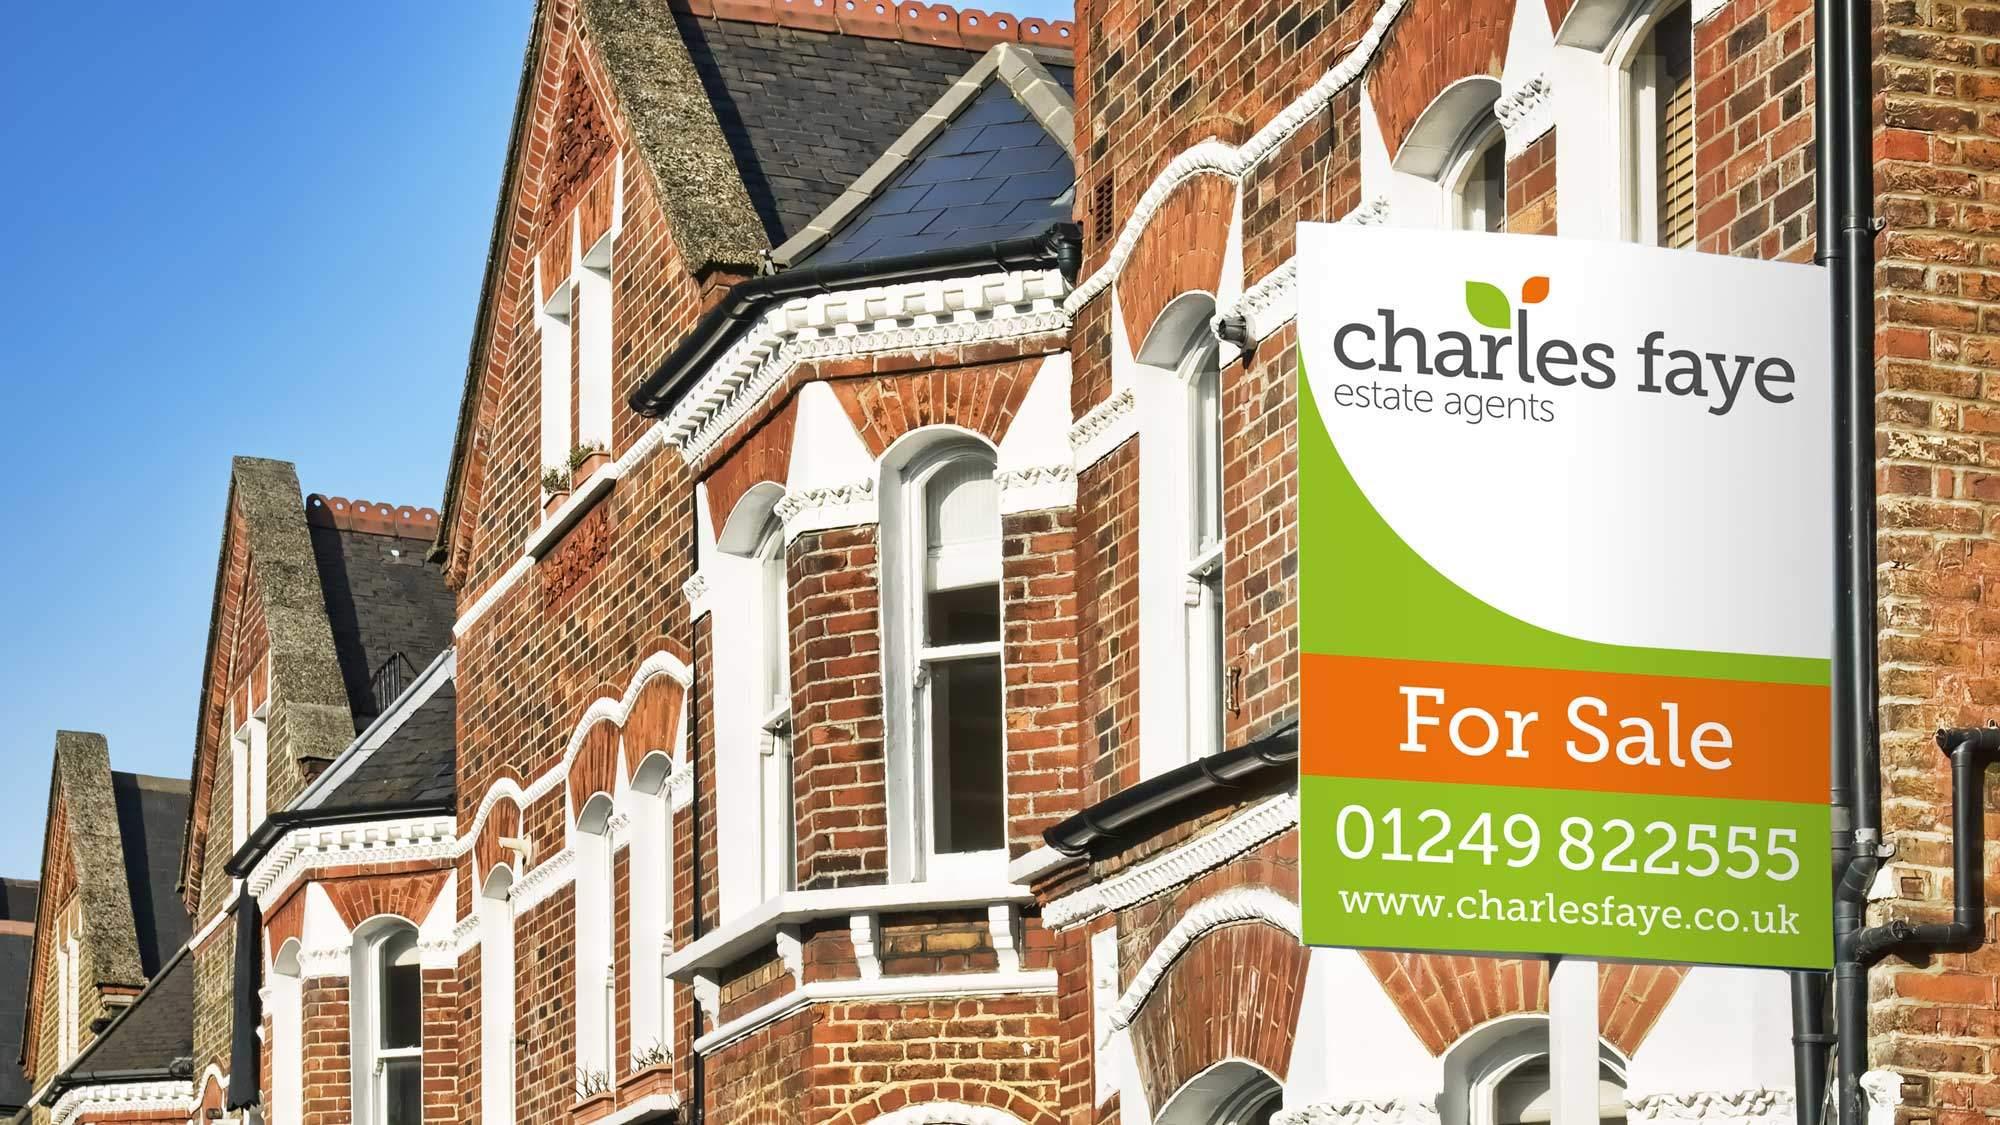 Estate agent branding on Charles Faye for sale sign